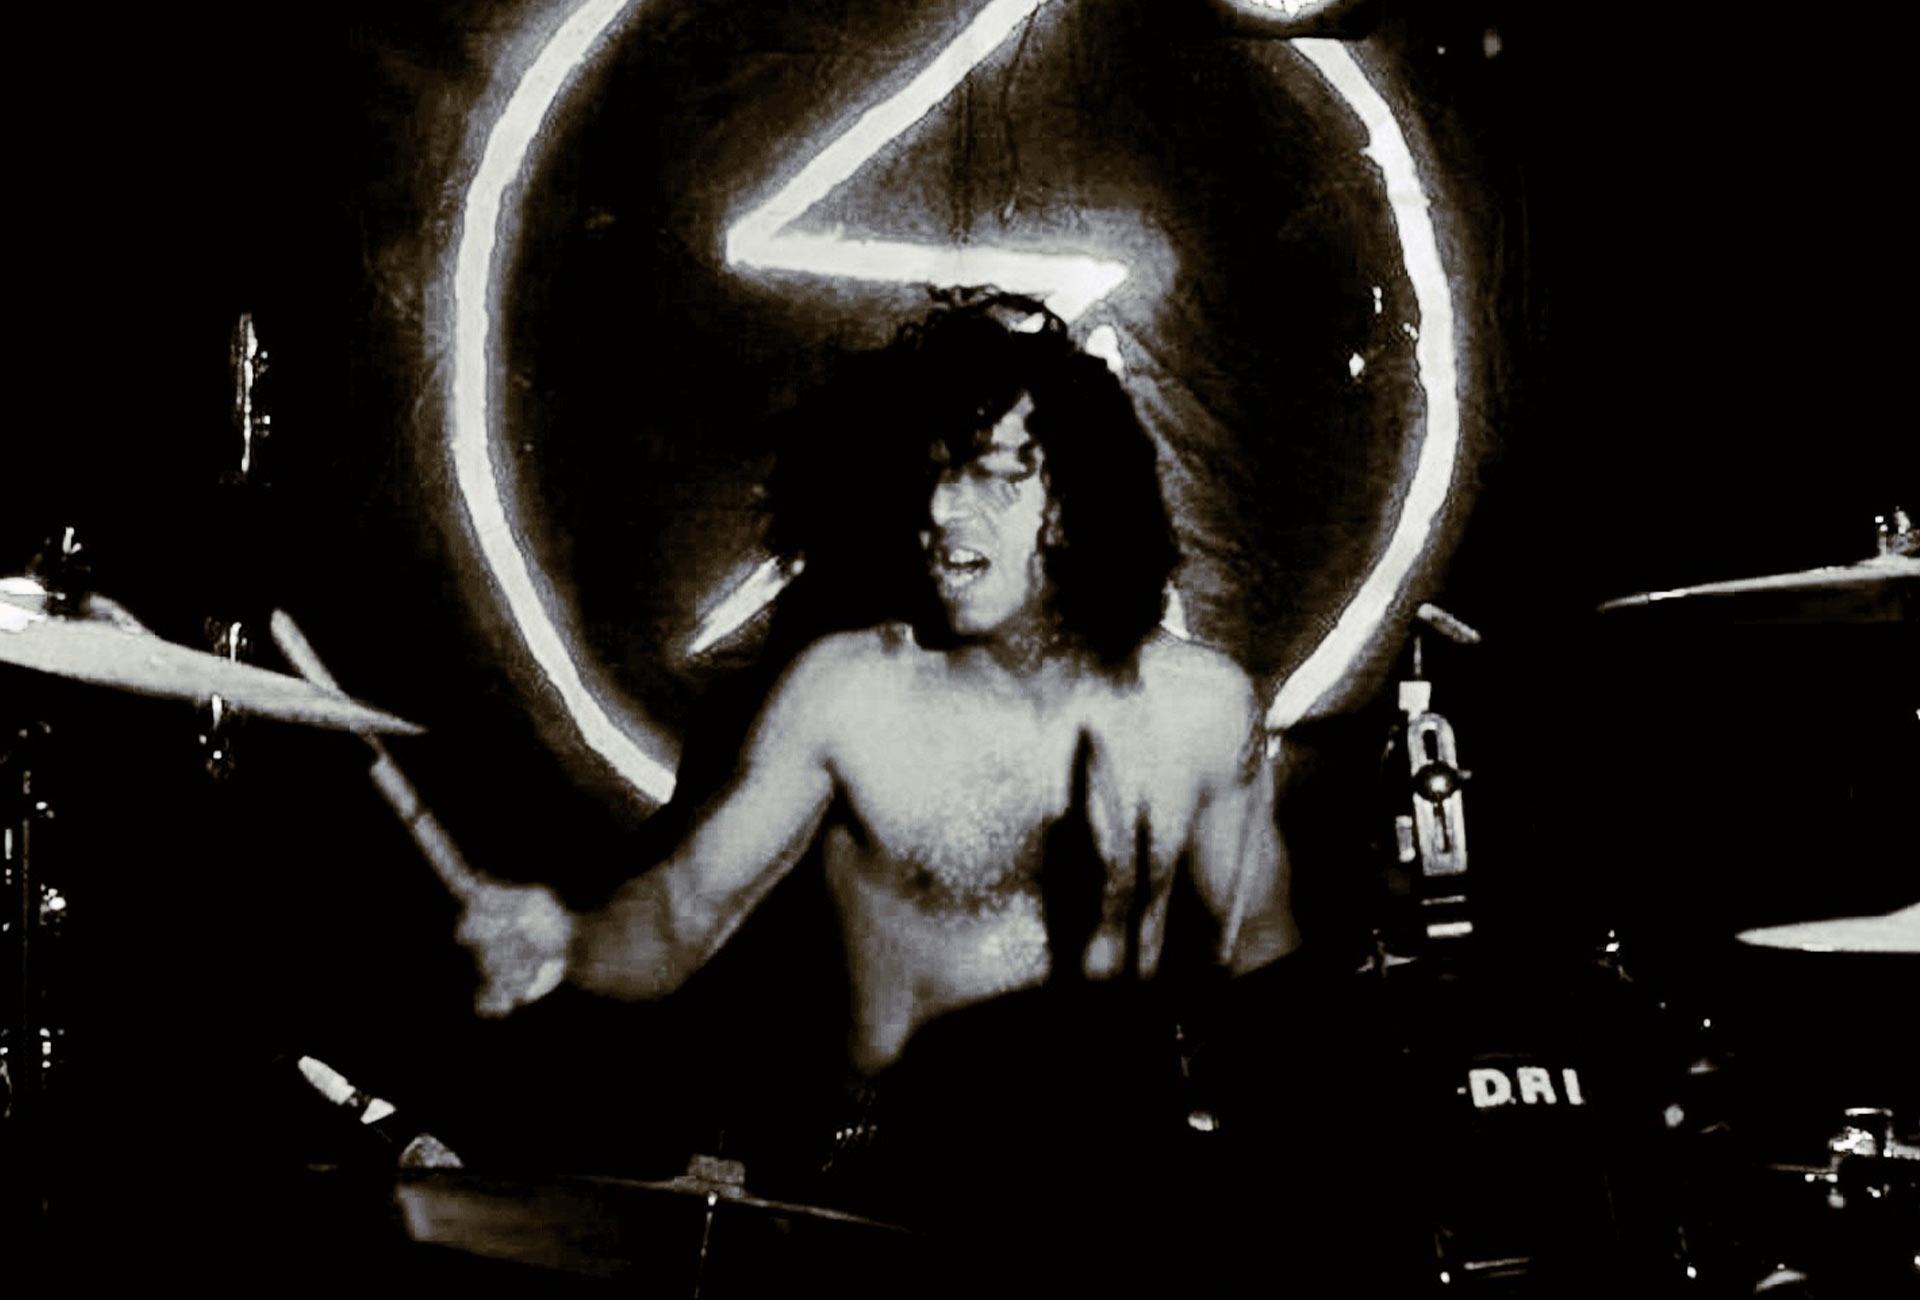 Jeff Talley - Musician